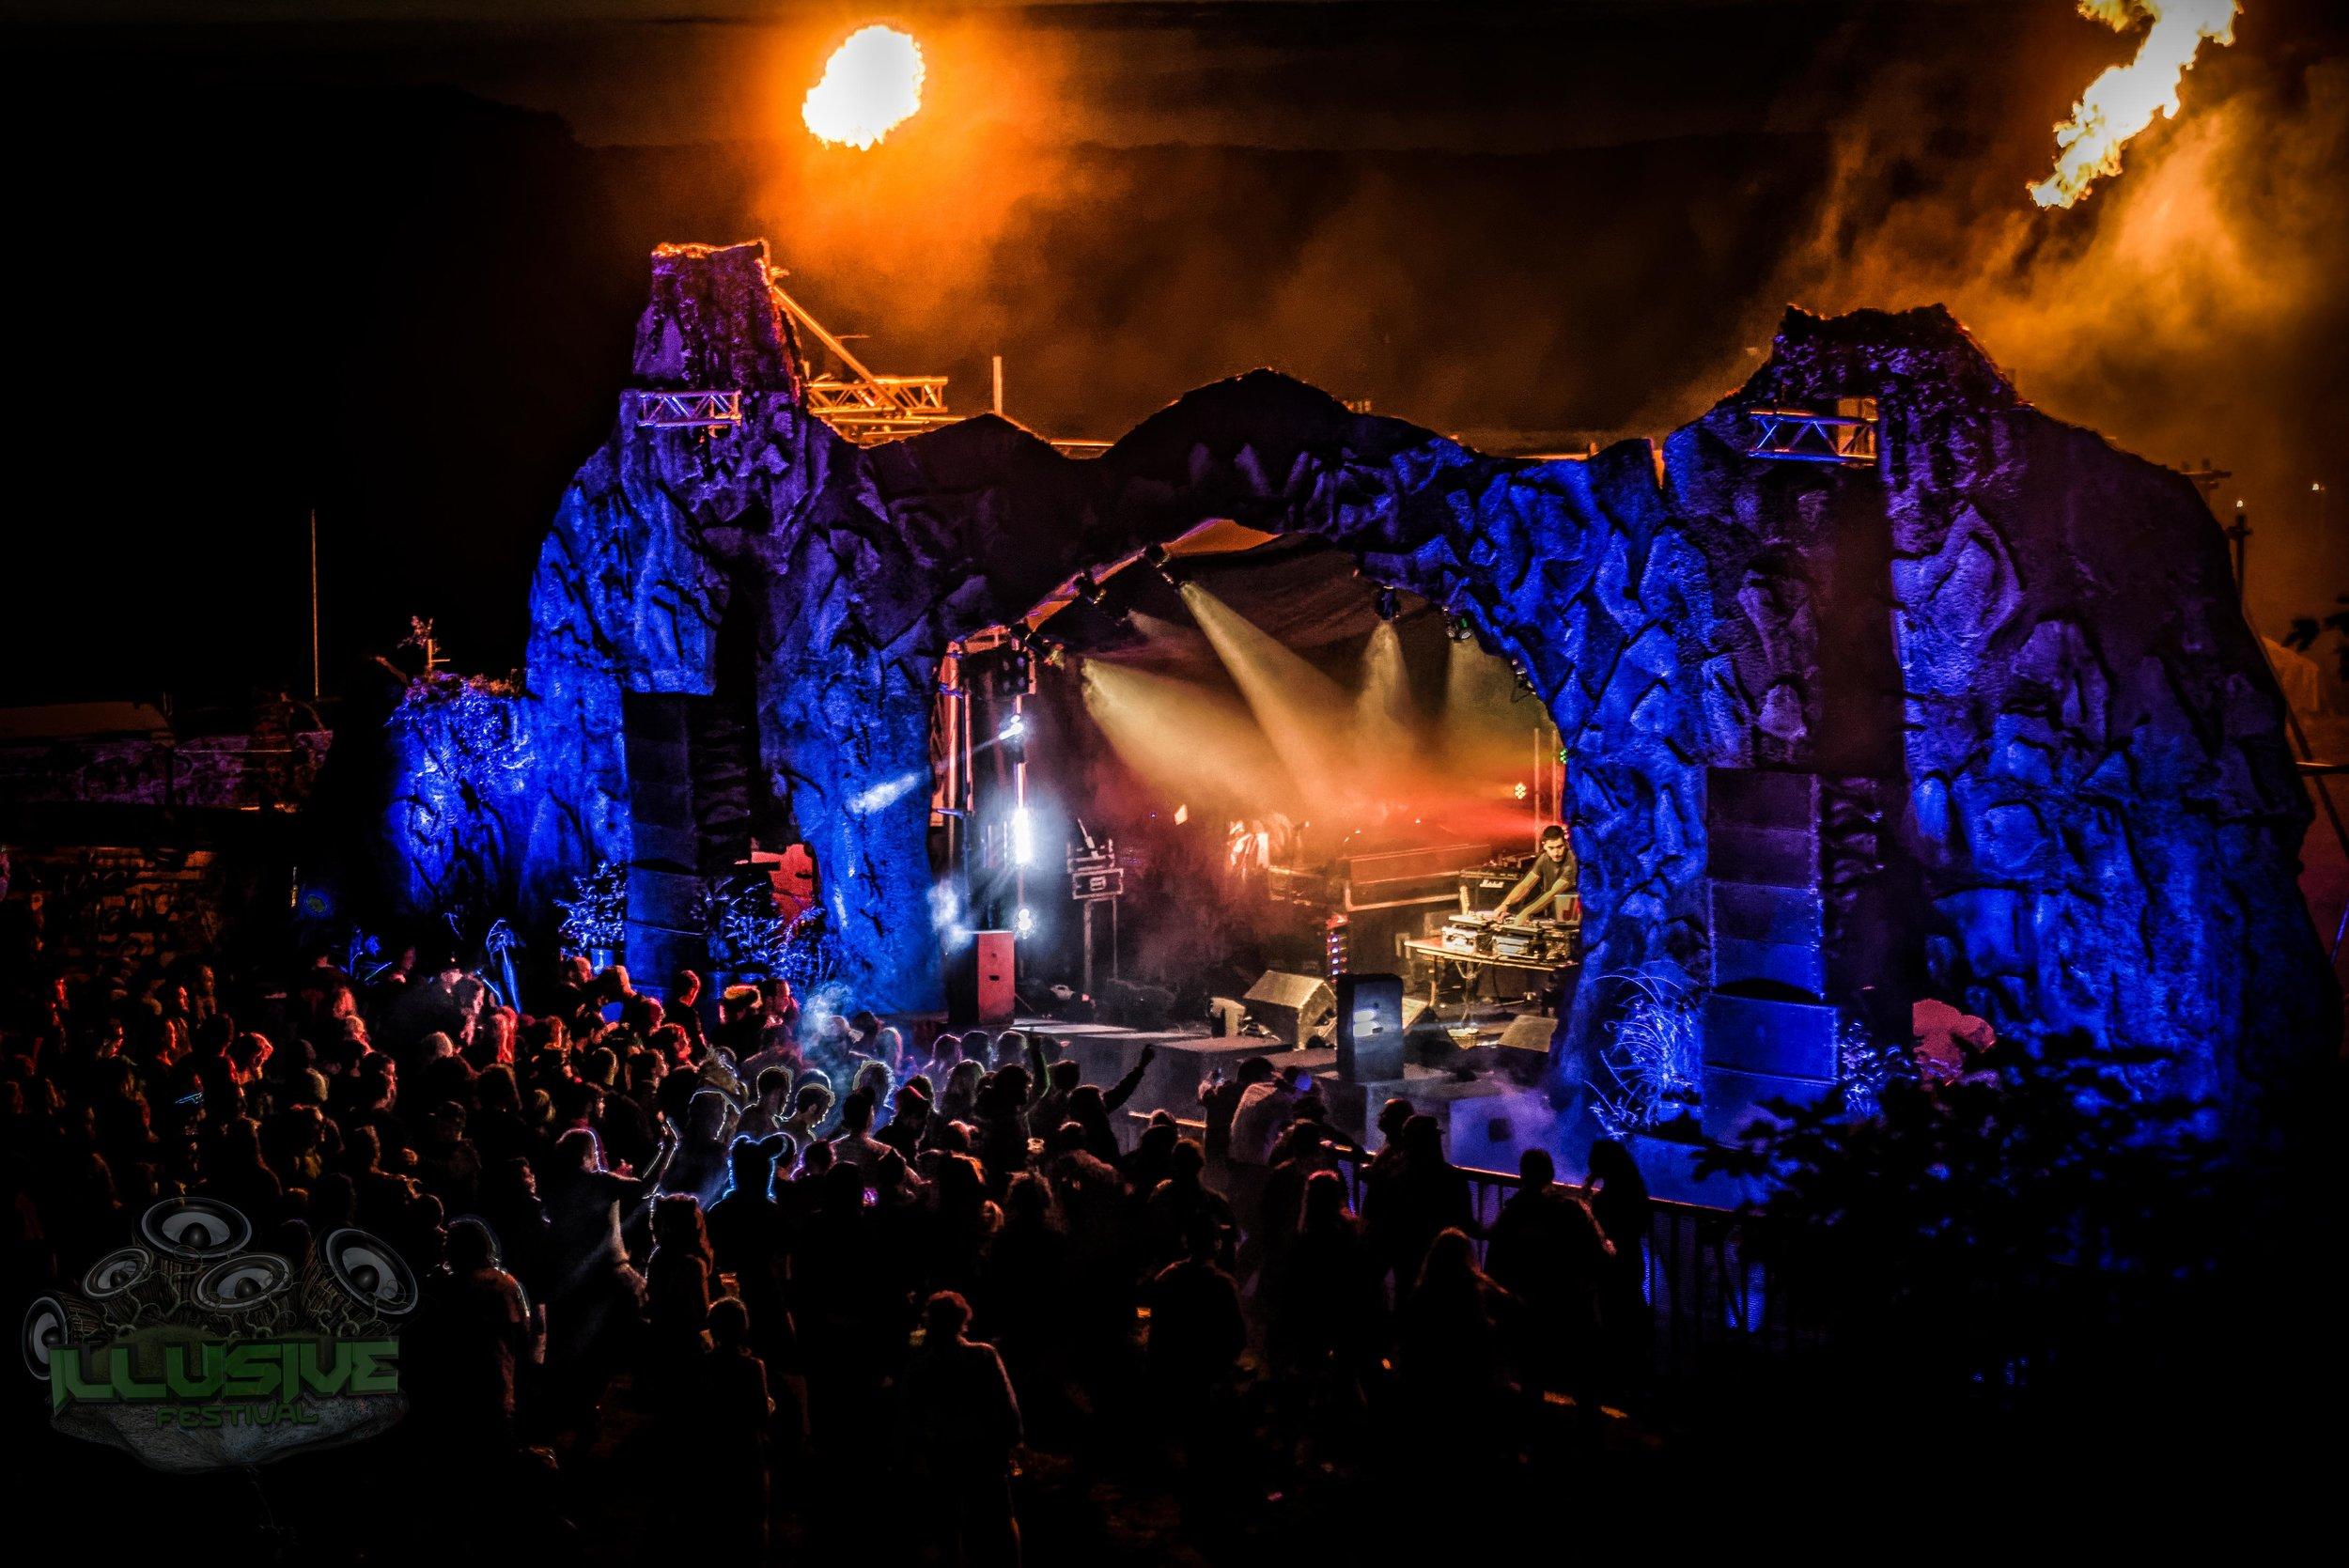 Mountain stage with orange backlit DJ.